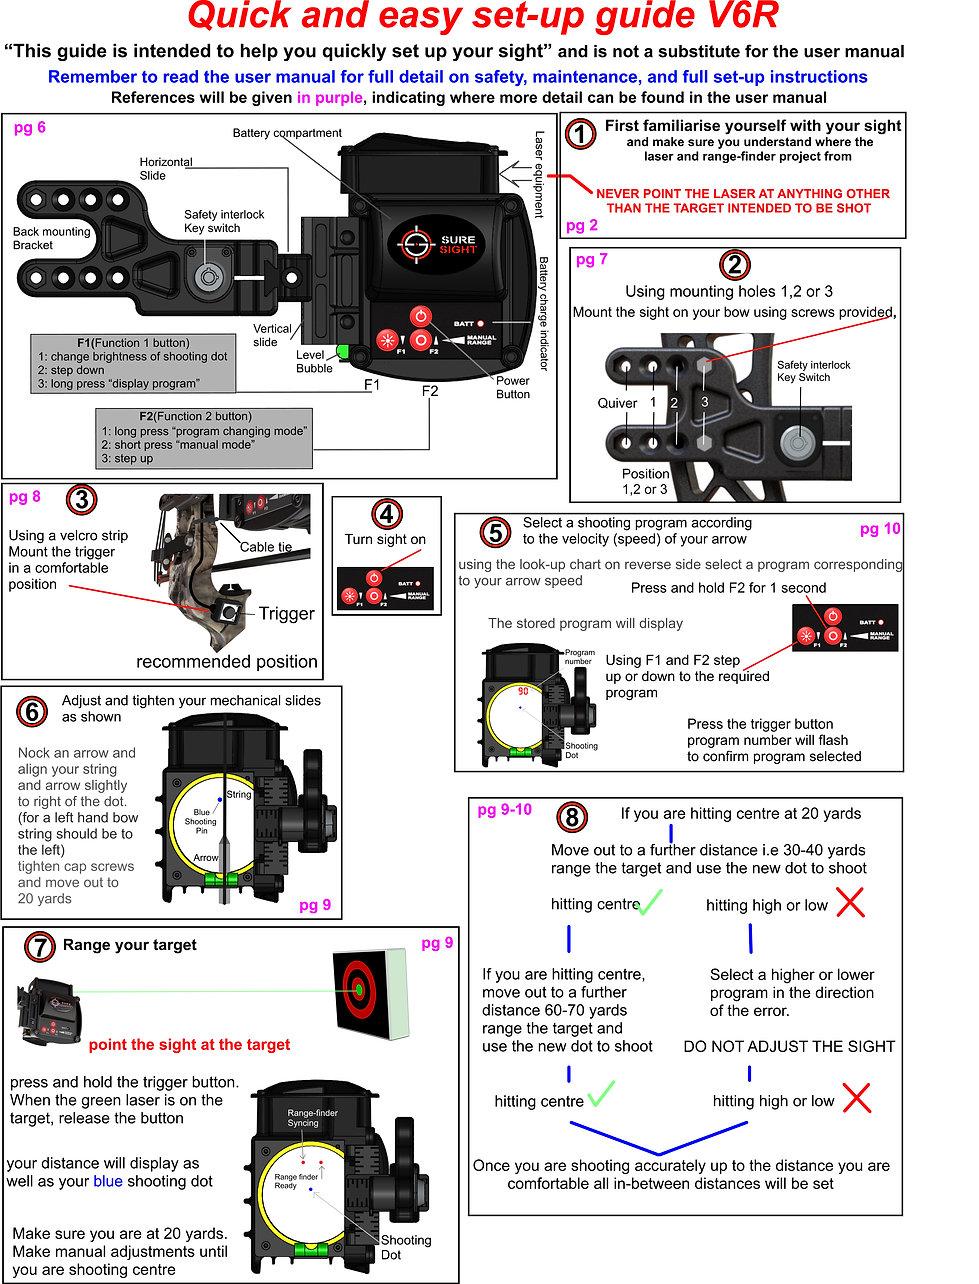 Quick Set-up Guide V6R.jpg